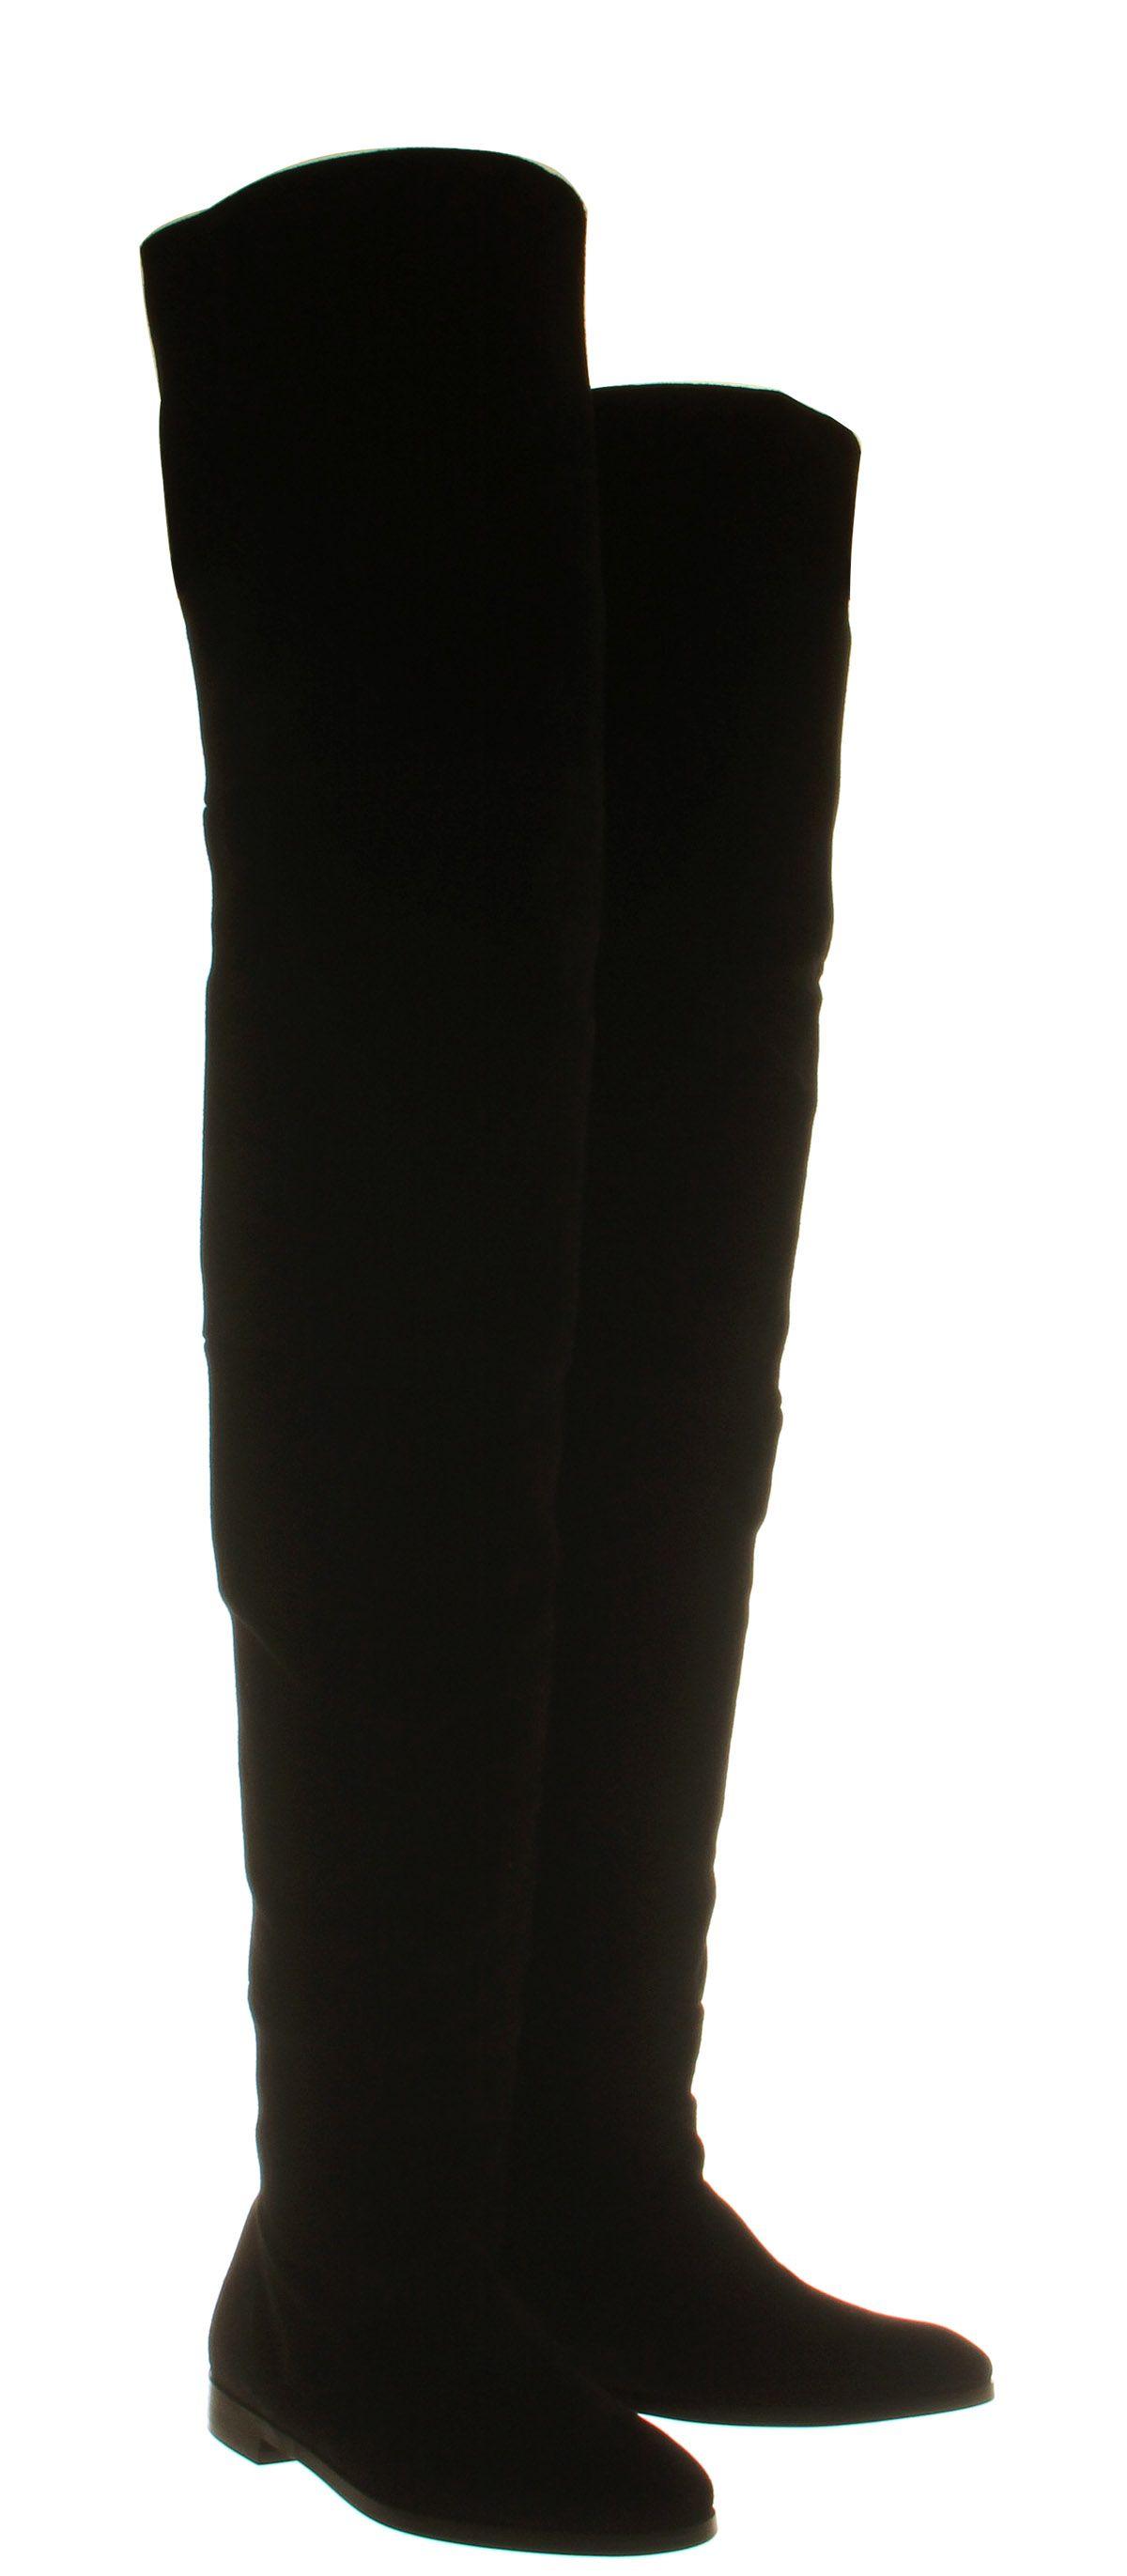 cc683ba643c57 Office Nova 2 Extra High Thigh High Boot Black Suede - Knee Boots ...